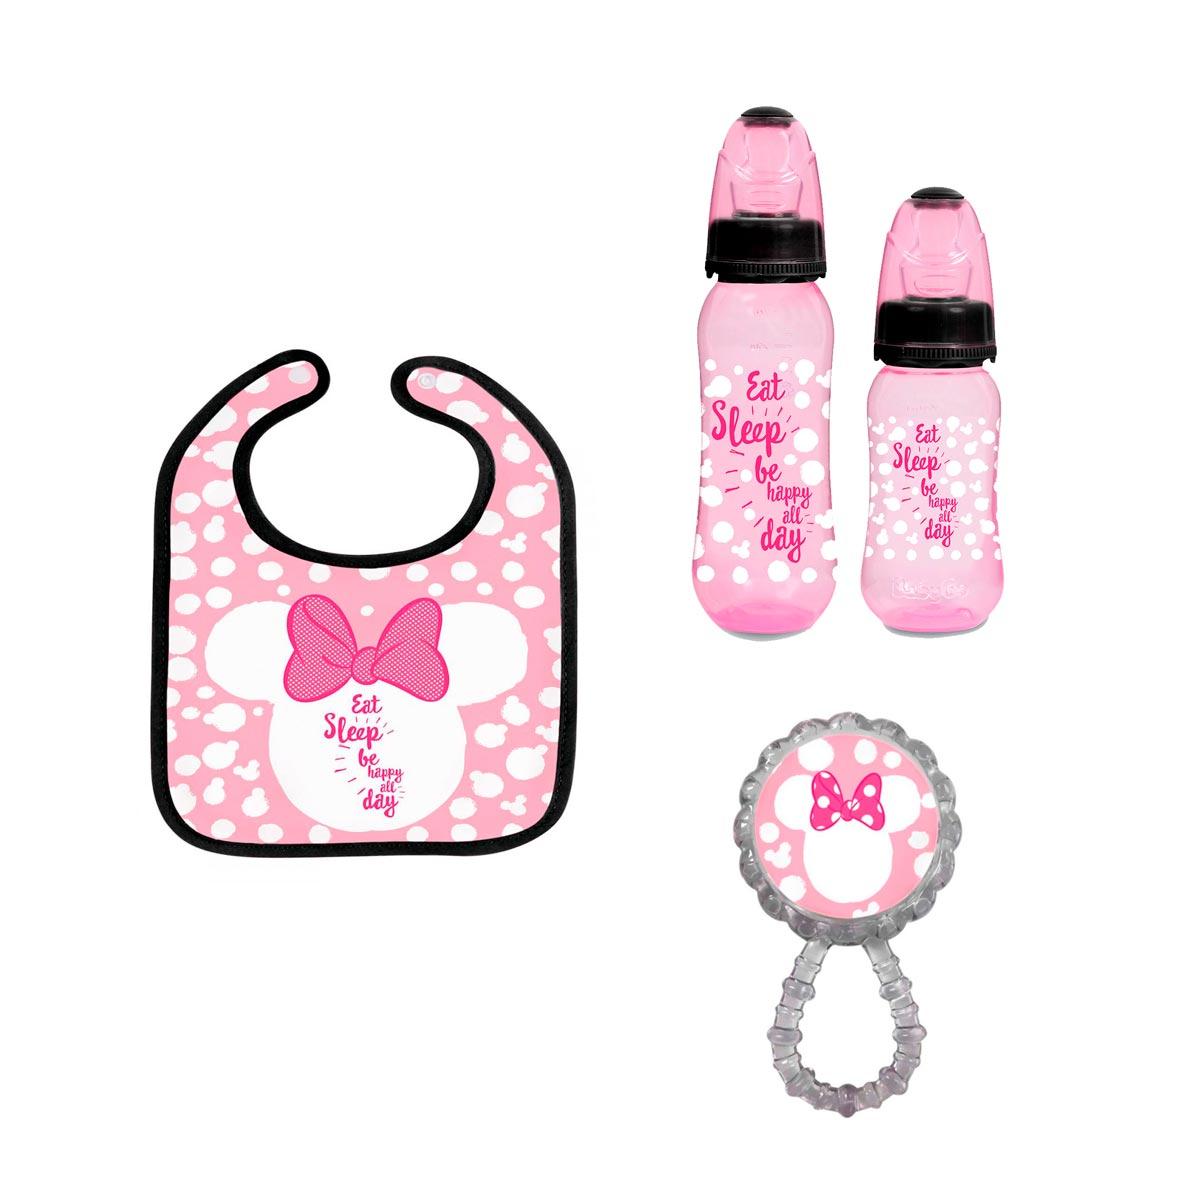 Kit Presente Maternidade Básico Minnie Mouse Disney